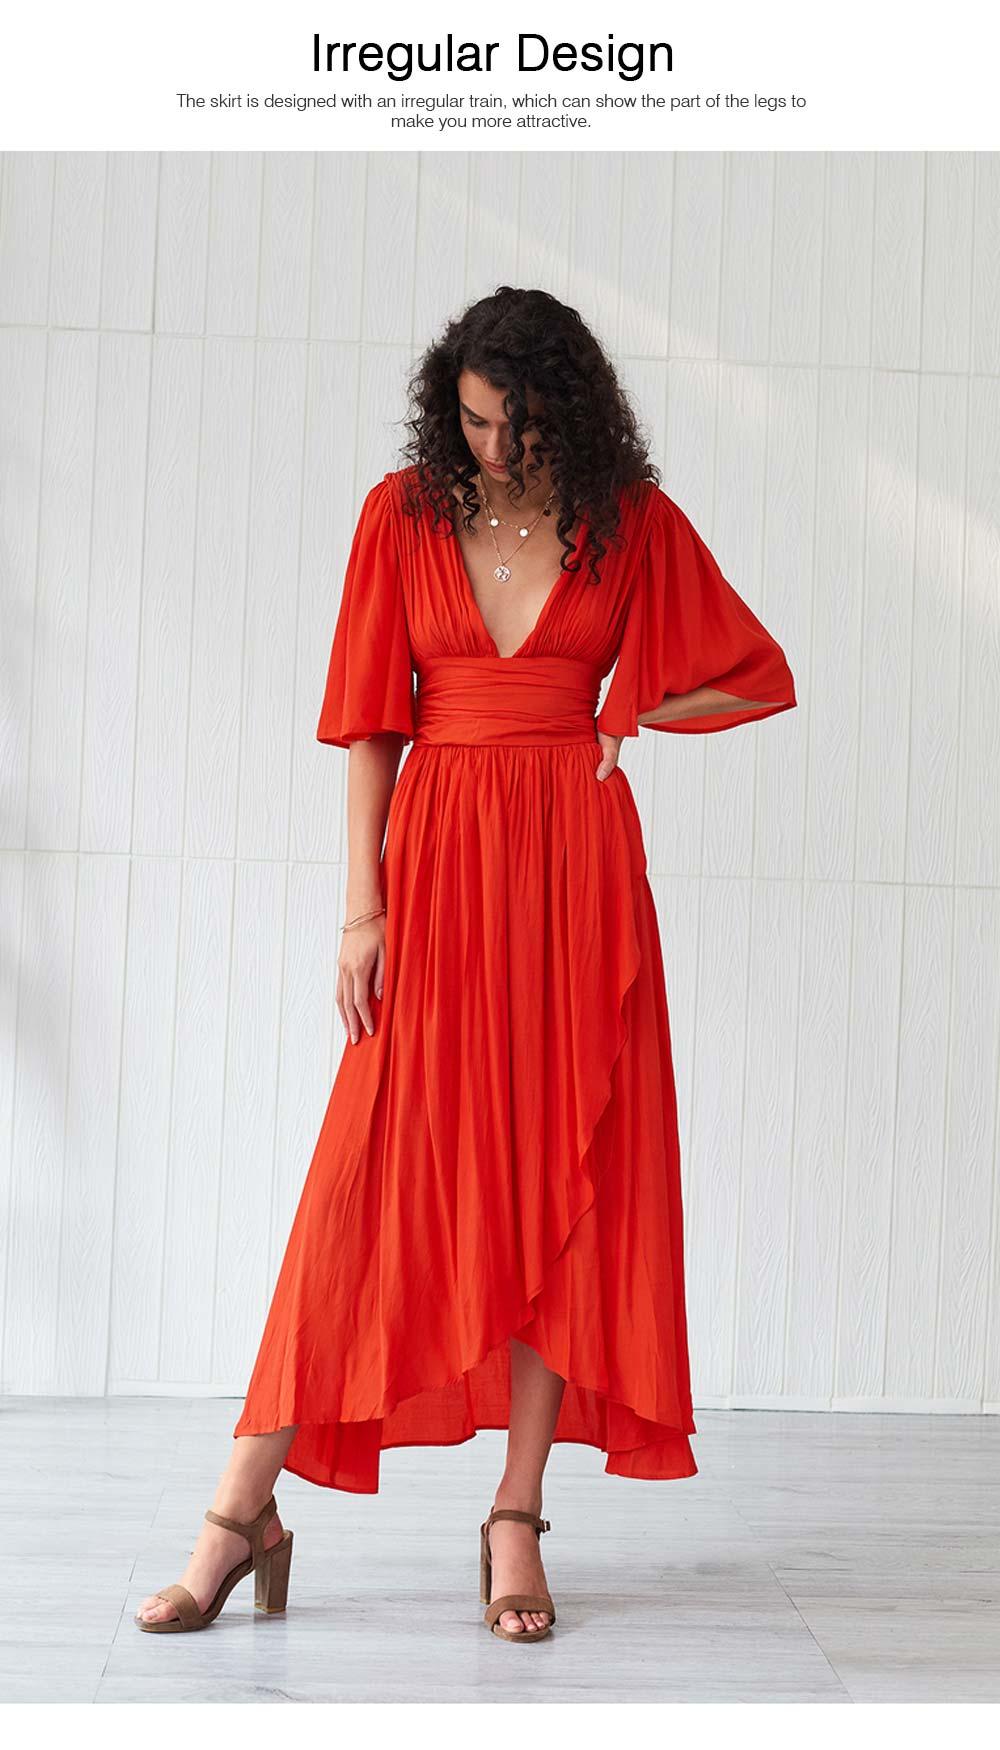 Deep V-neck Bohemian Dress Slim Waist Belt Irregular Style Orange Skirt Maxi Dress Summer for Women 1